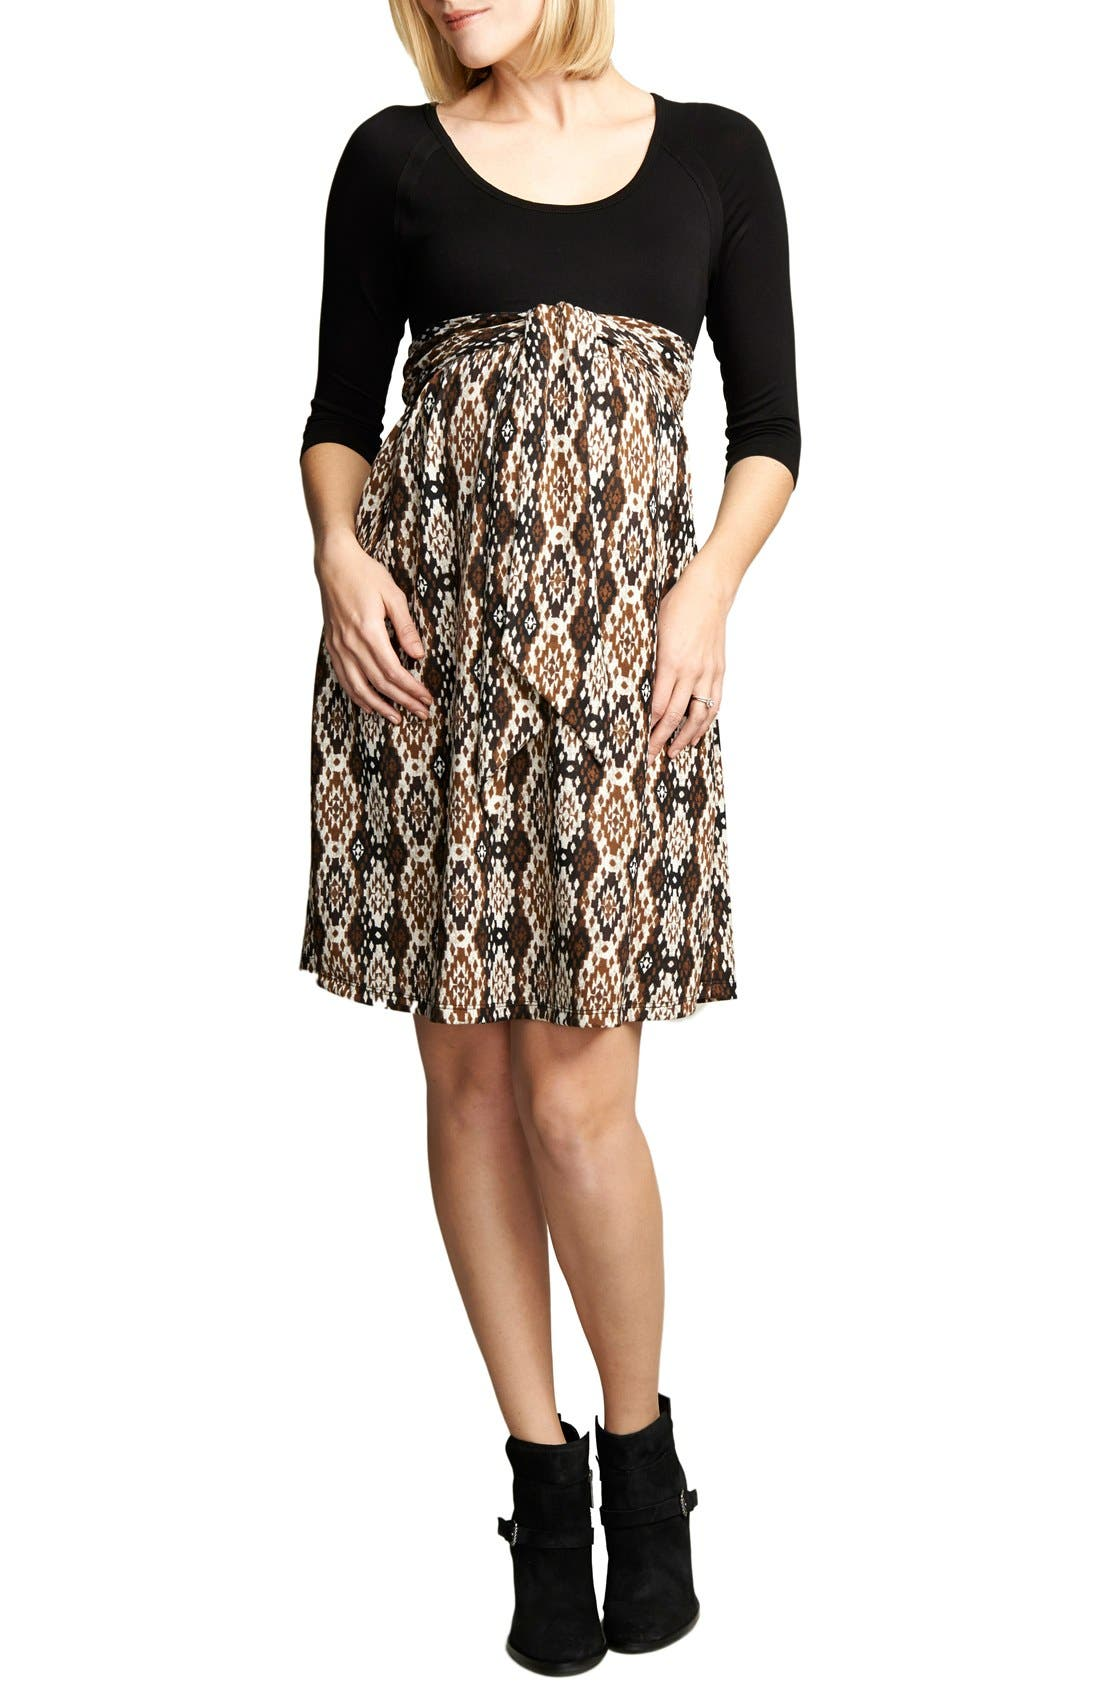 Ikat Print Tie Front Dress,                         Main,                         color, BLACK/IKAT PRINT